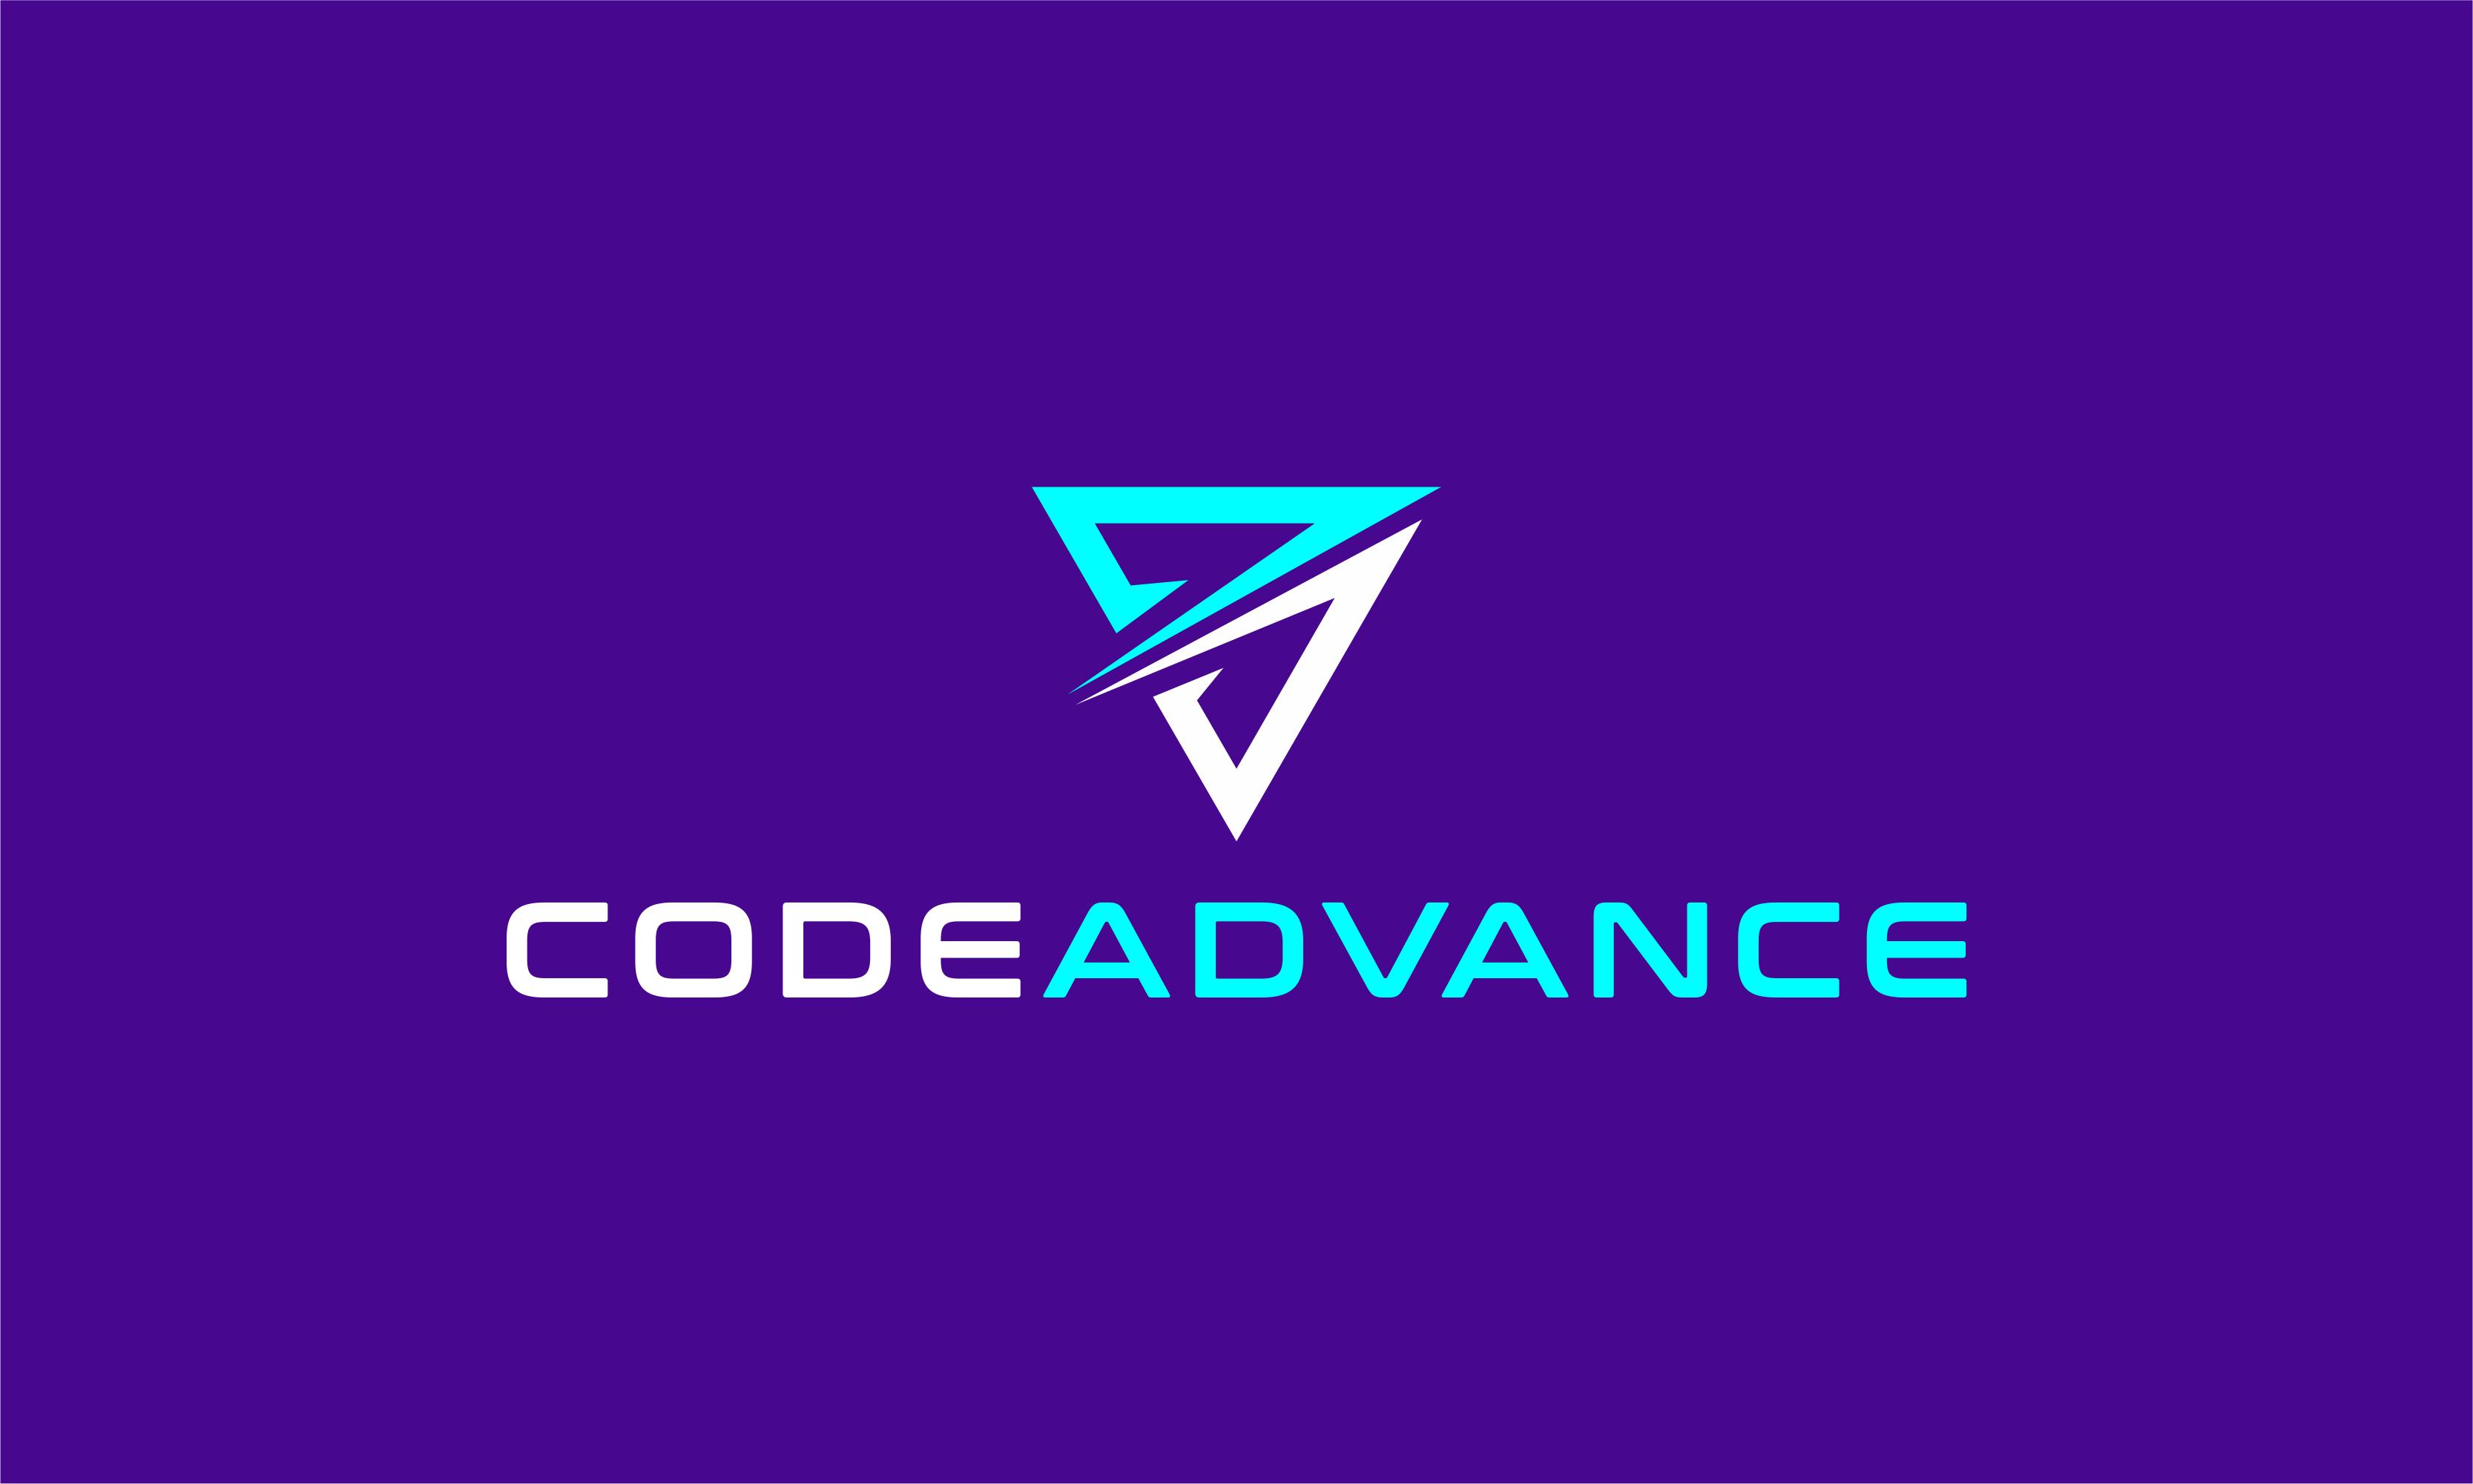 Codeadvance